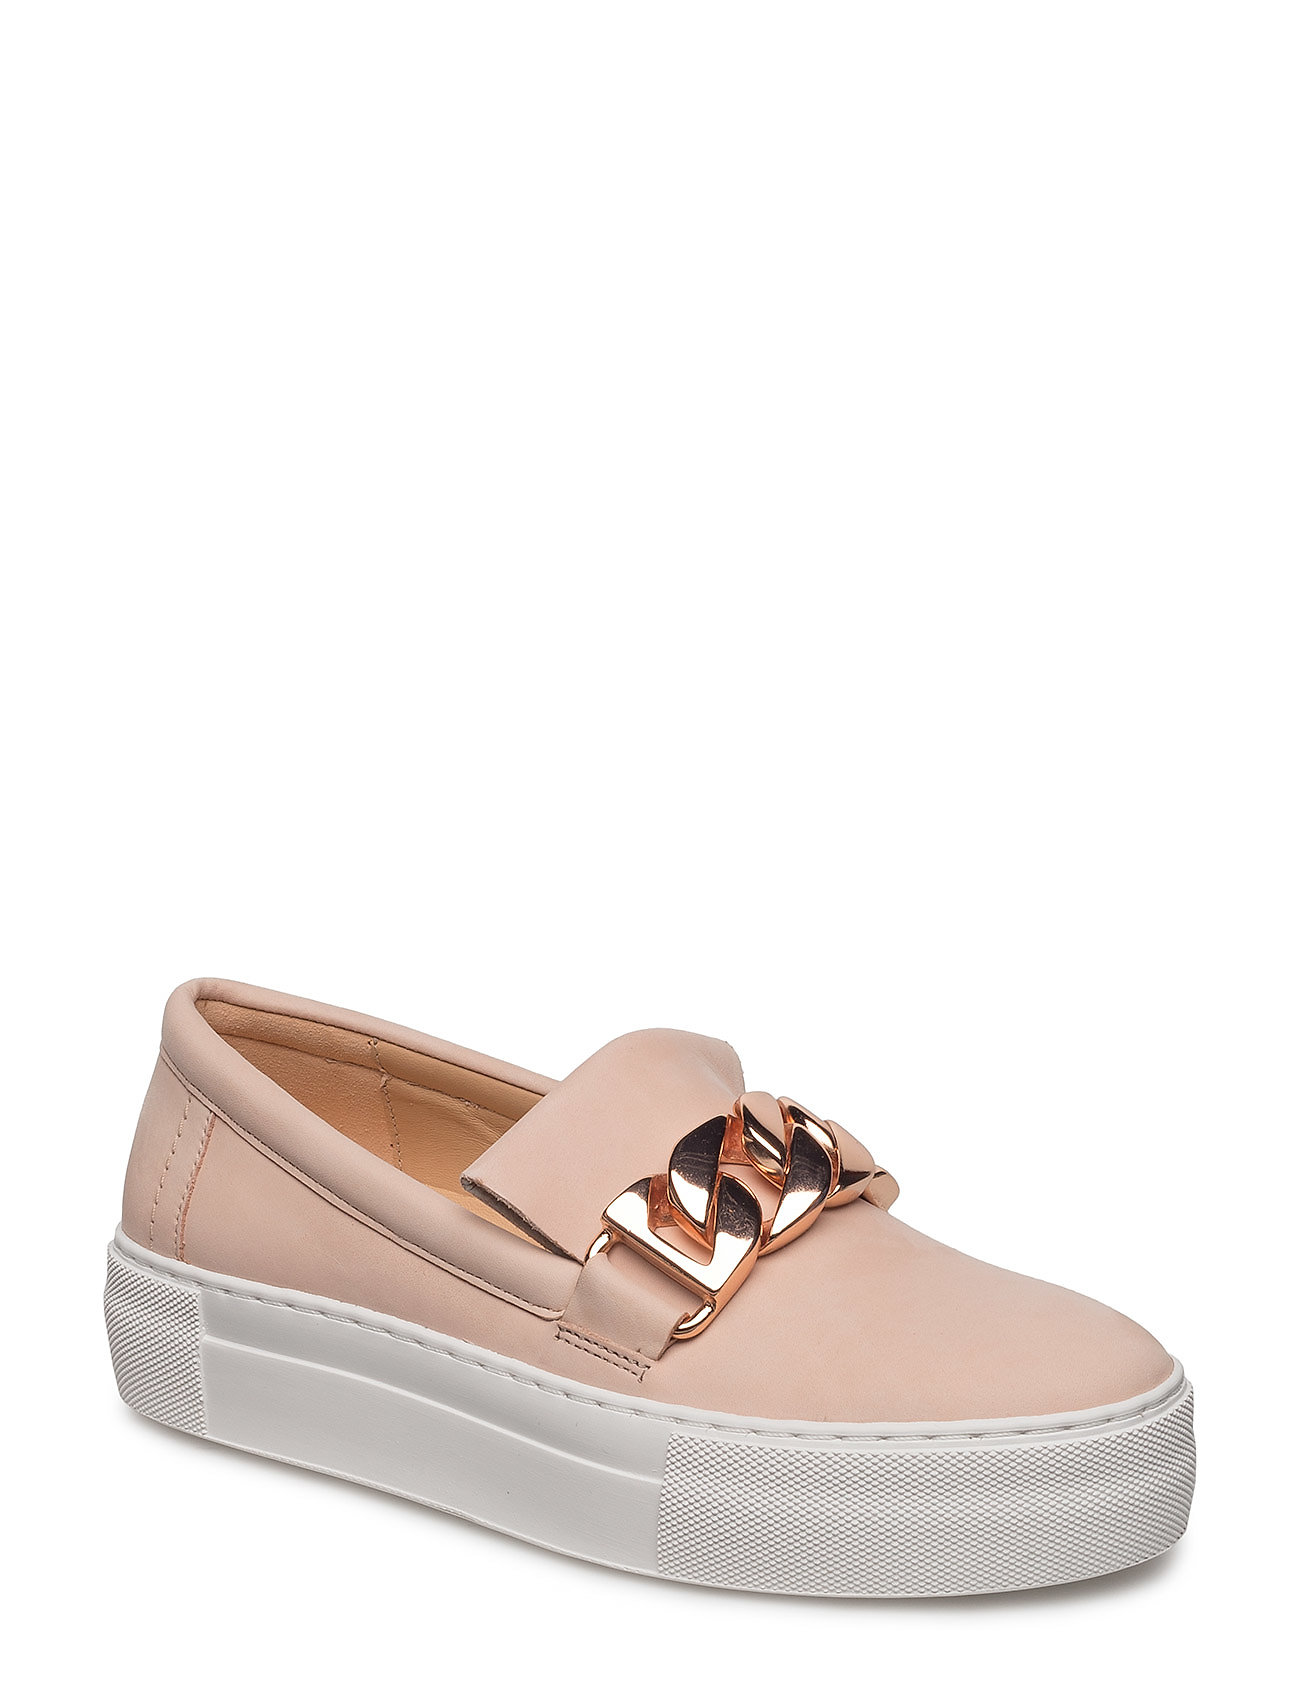 03c089c58827 Billi Bi Shoes (Nude Nubuck rose Gold 488)